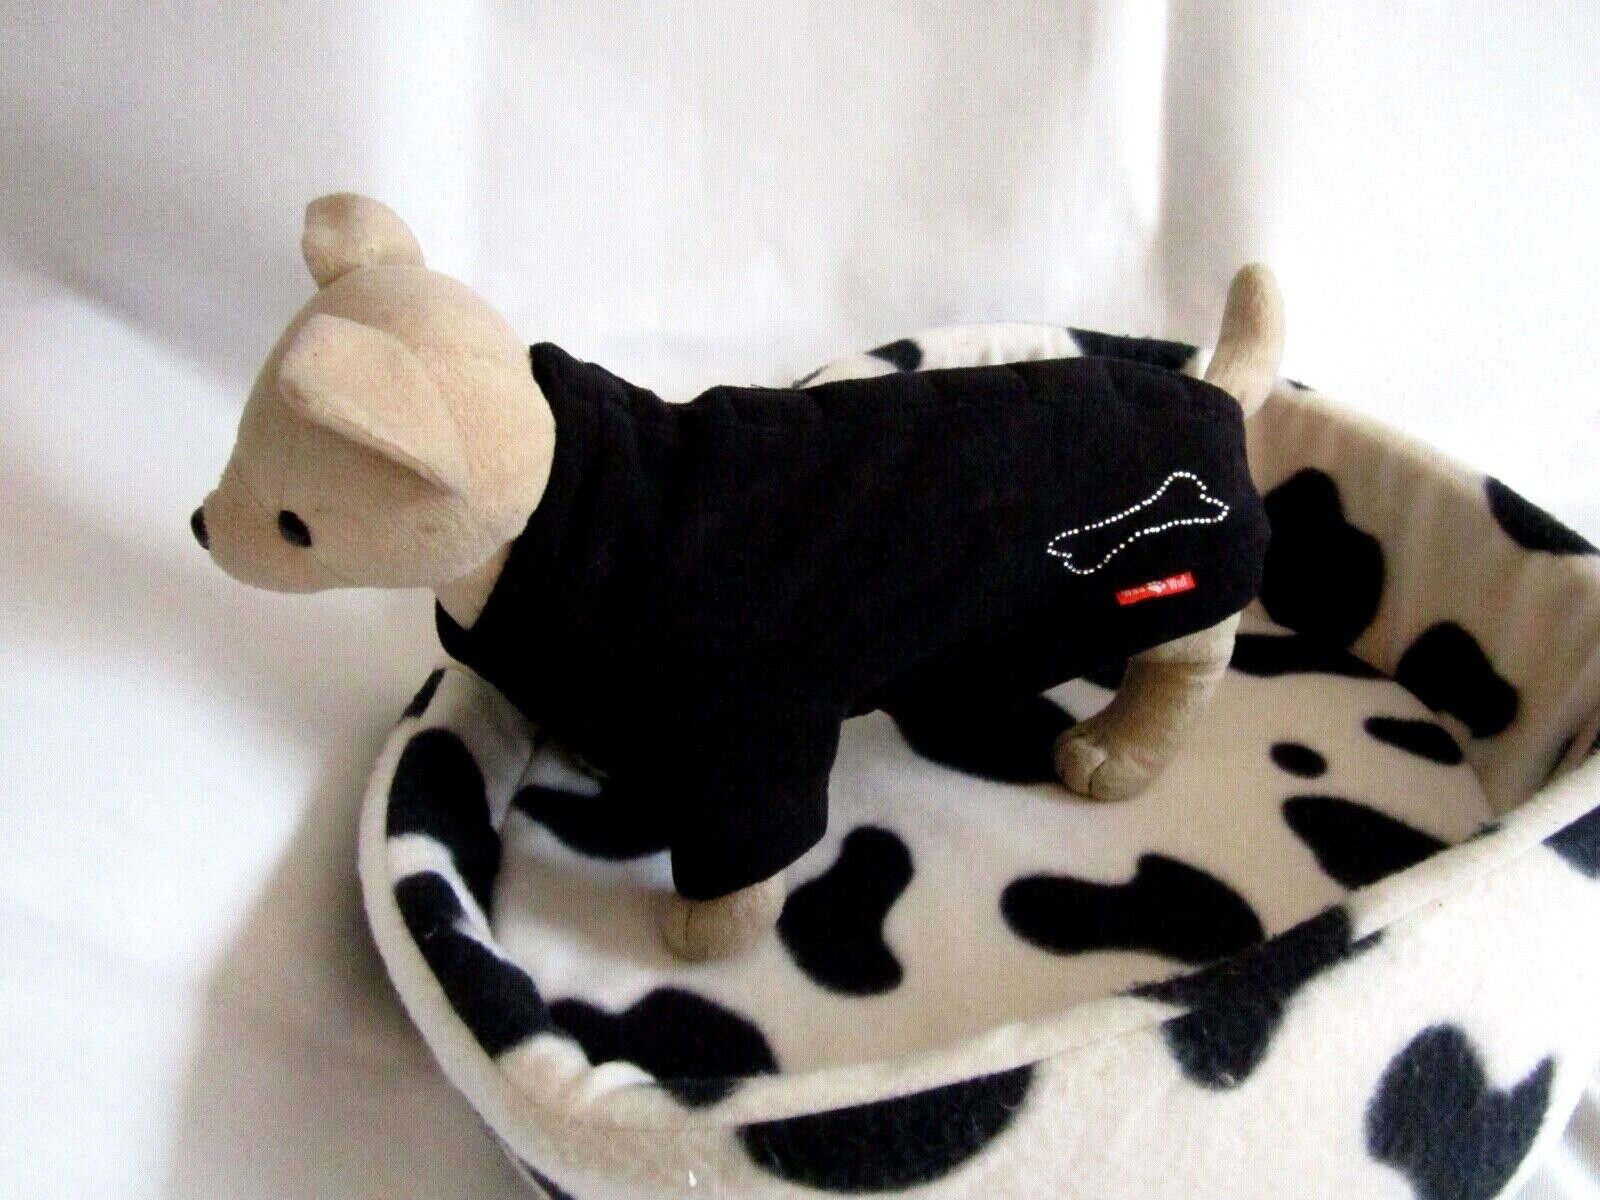 Hunde Fleece Pulli Pullover Rl.ca.27-32cm Umfang ca.35cm Chihuahua,Yorkshire